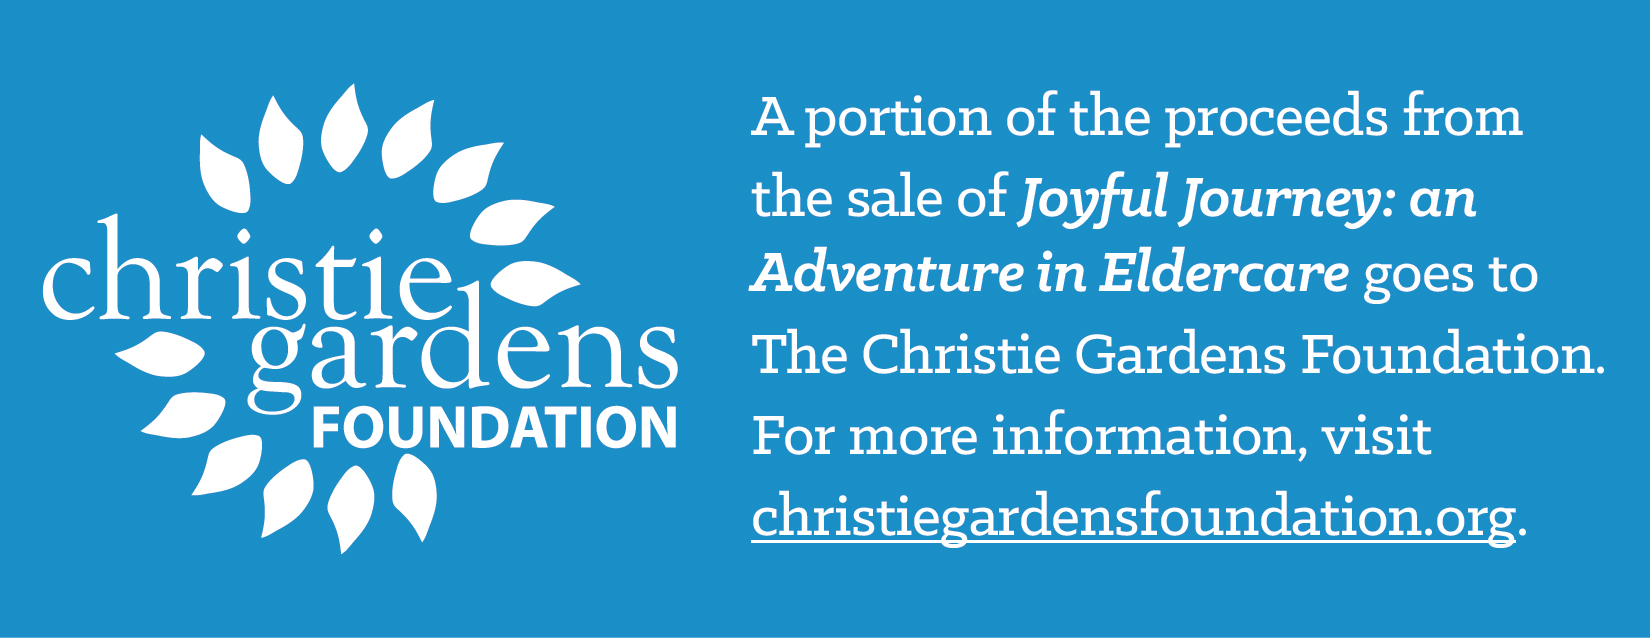 The Christie Gardens Foundation